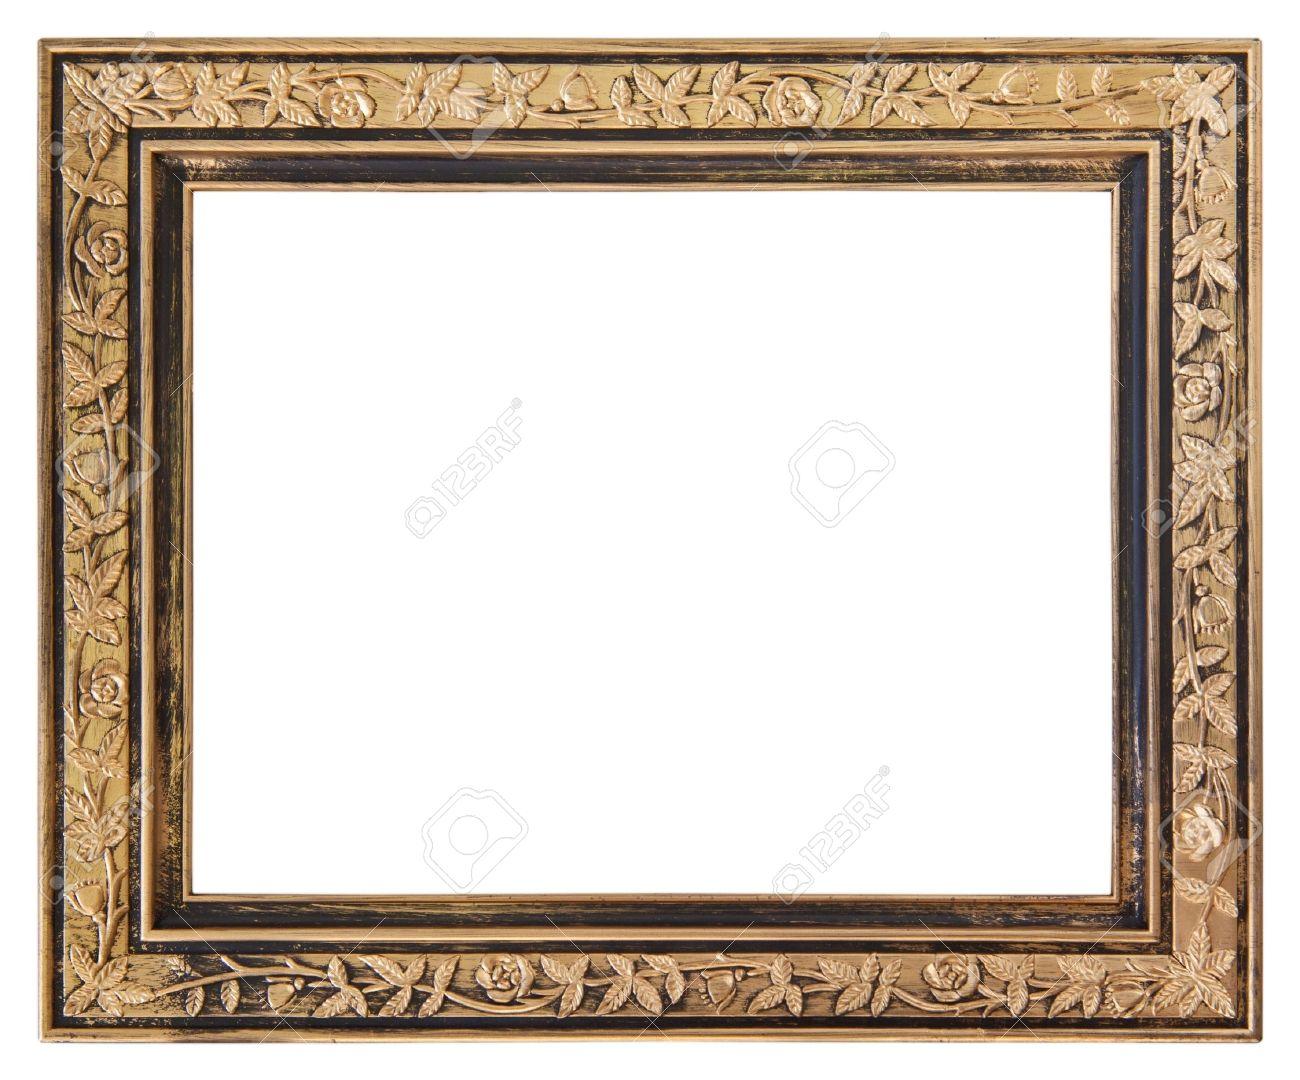 Gold frame isolated on white background Stock Photo - 19541265